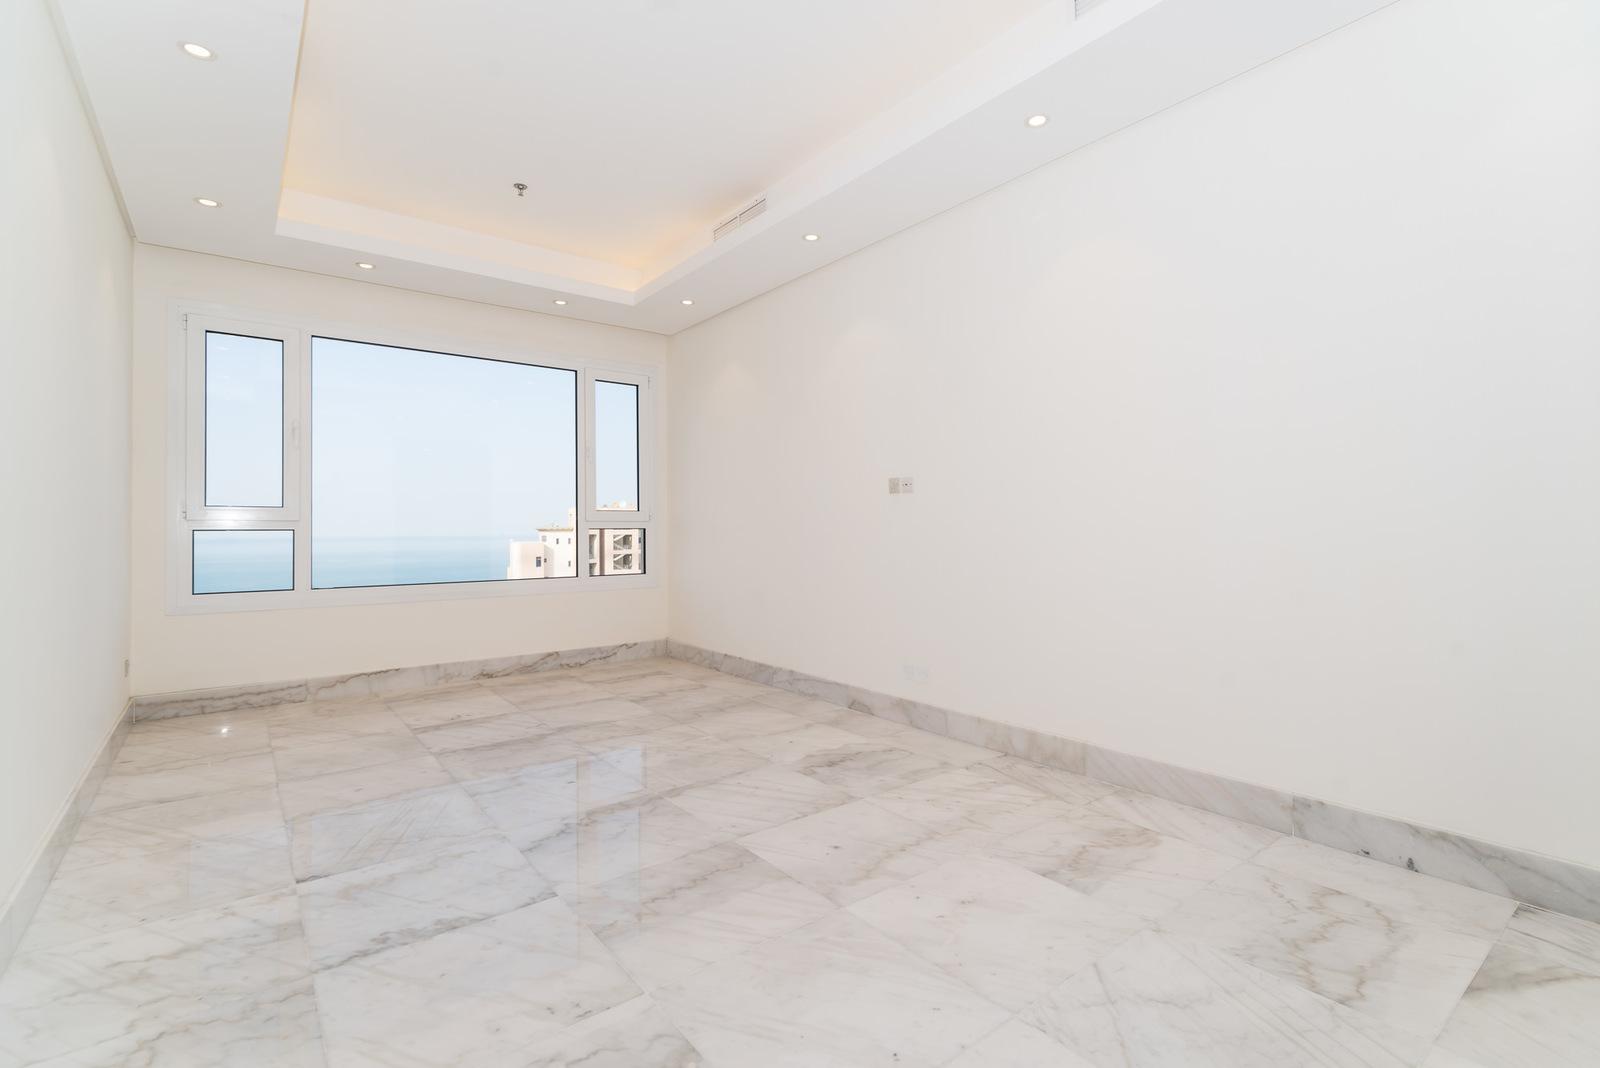 Shaab – unfurnished, se view, three bedroom apartments w/pool